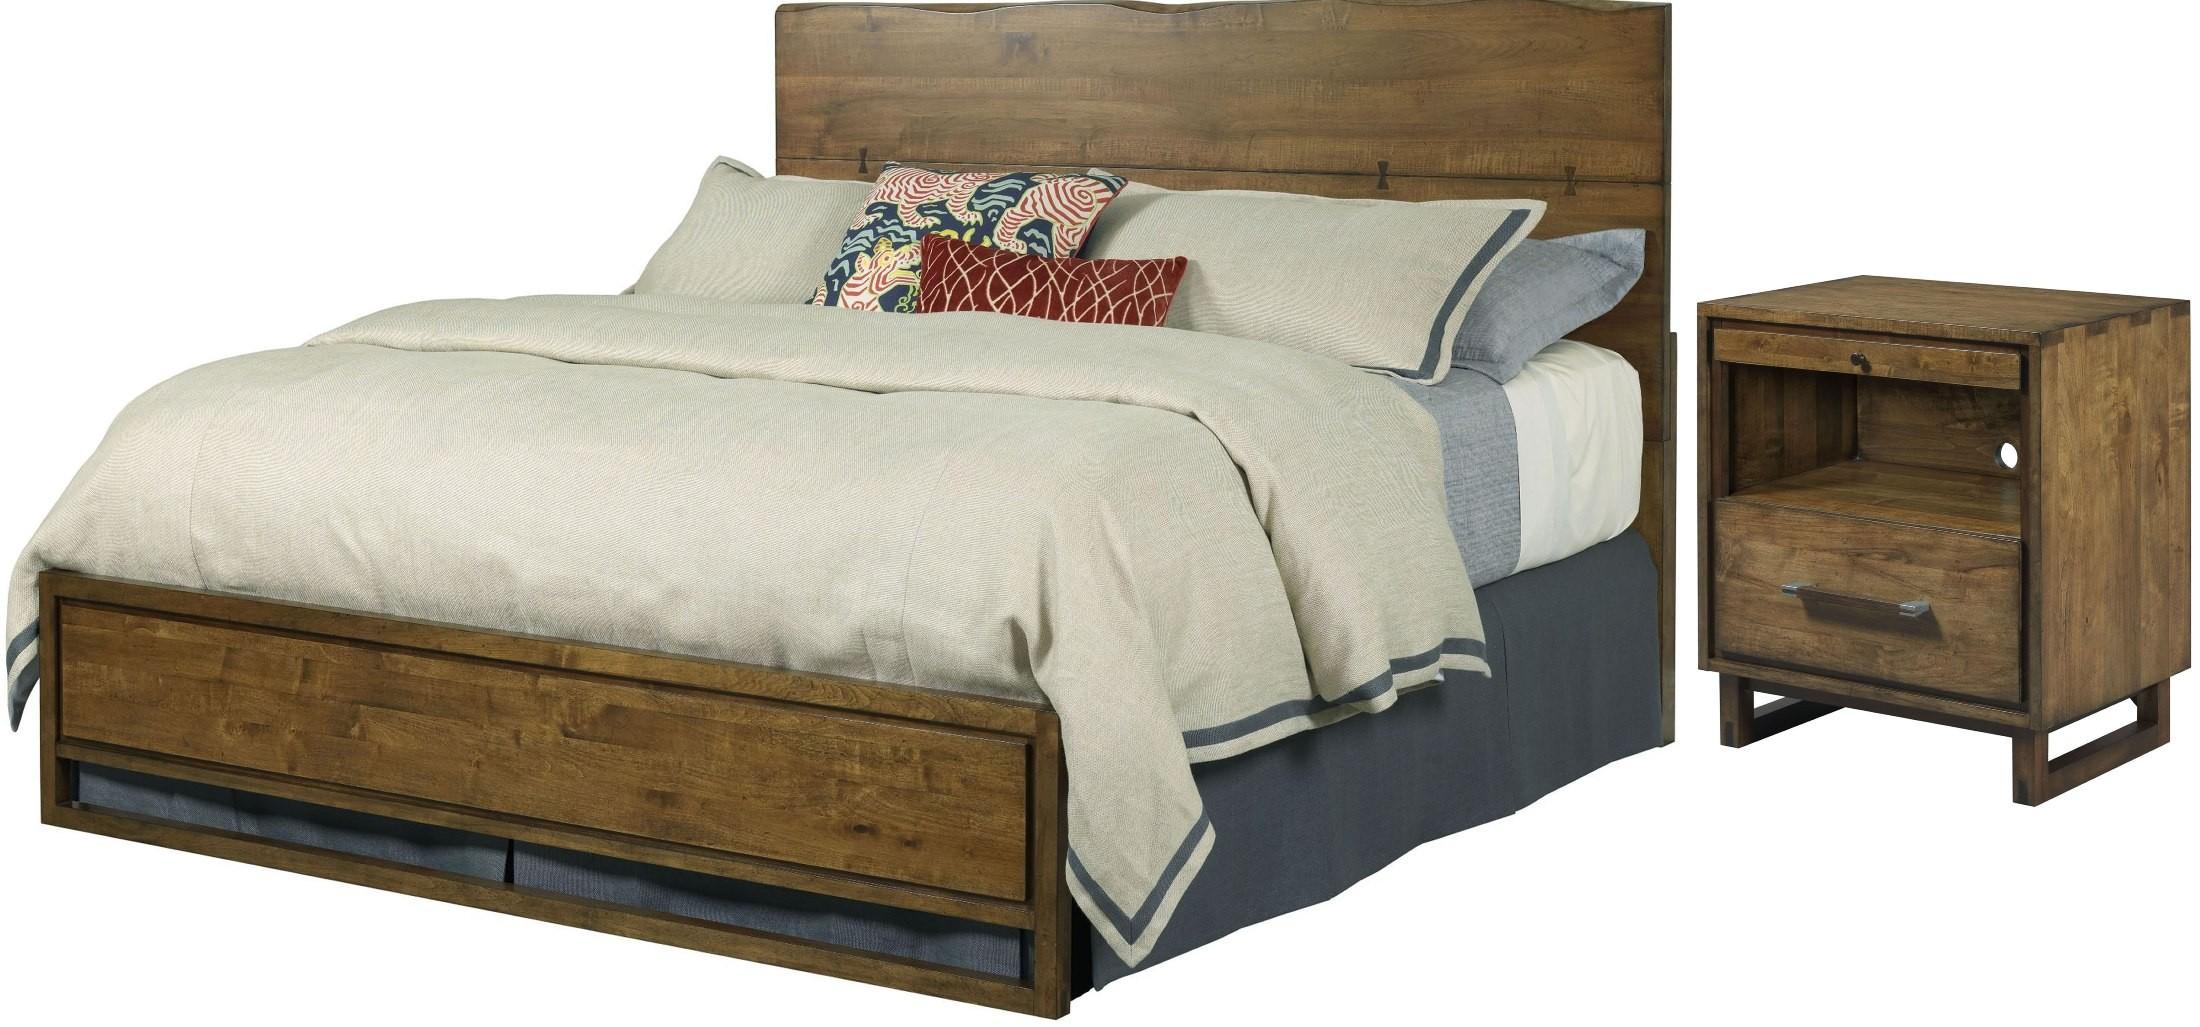 traverse brown craftsman platform bedroom set 660 304p